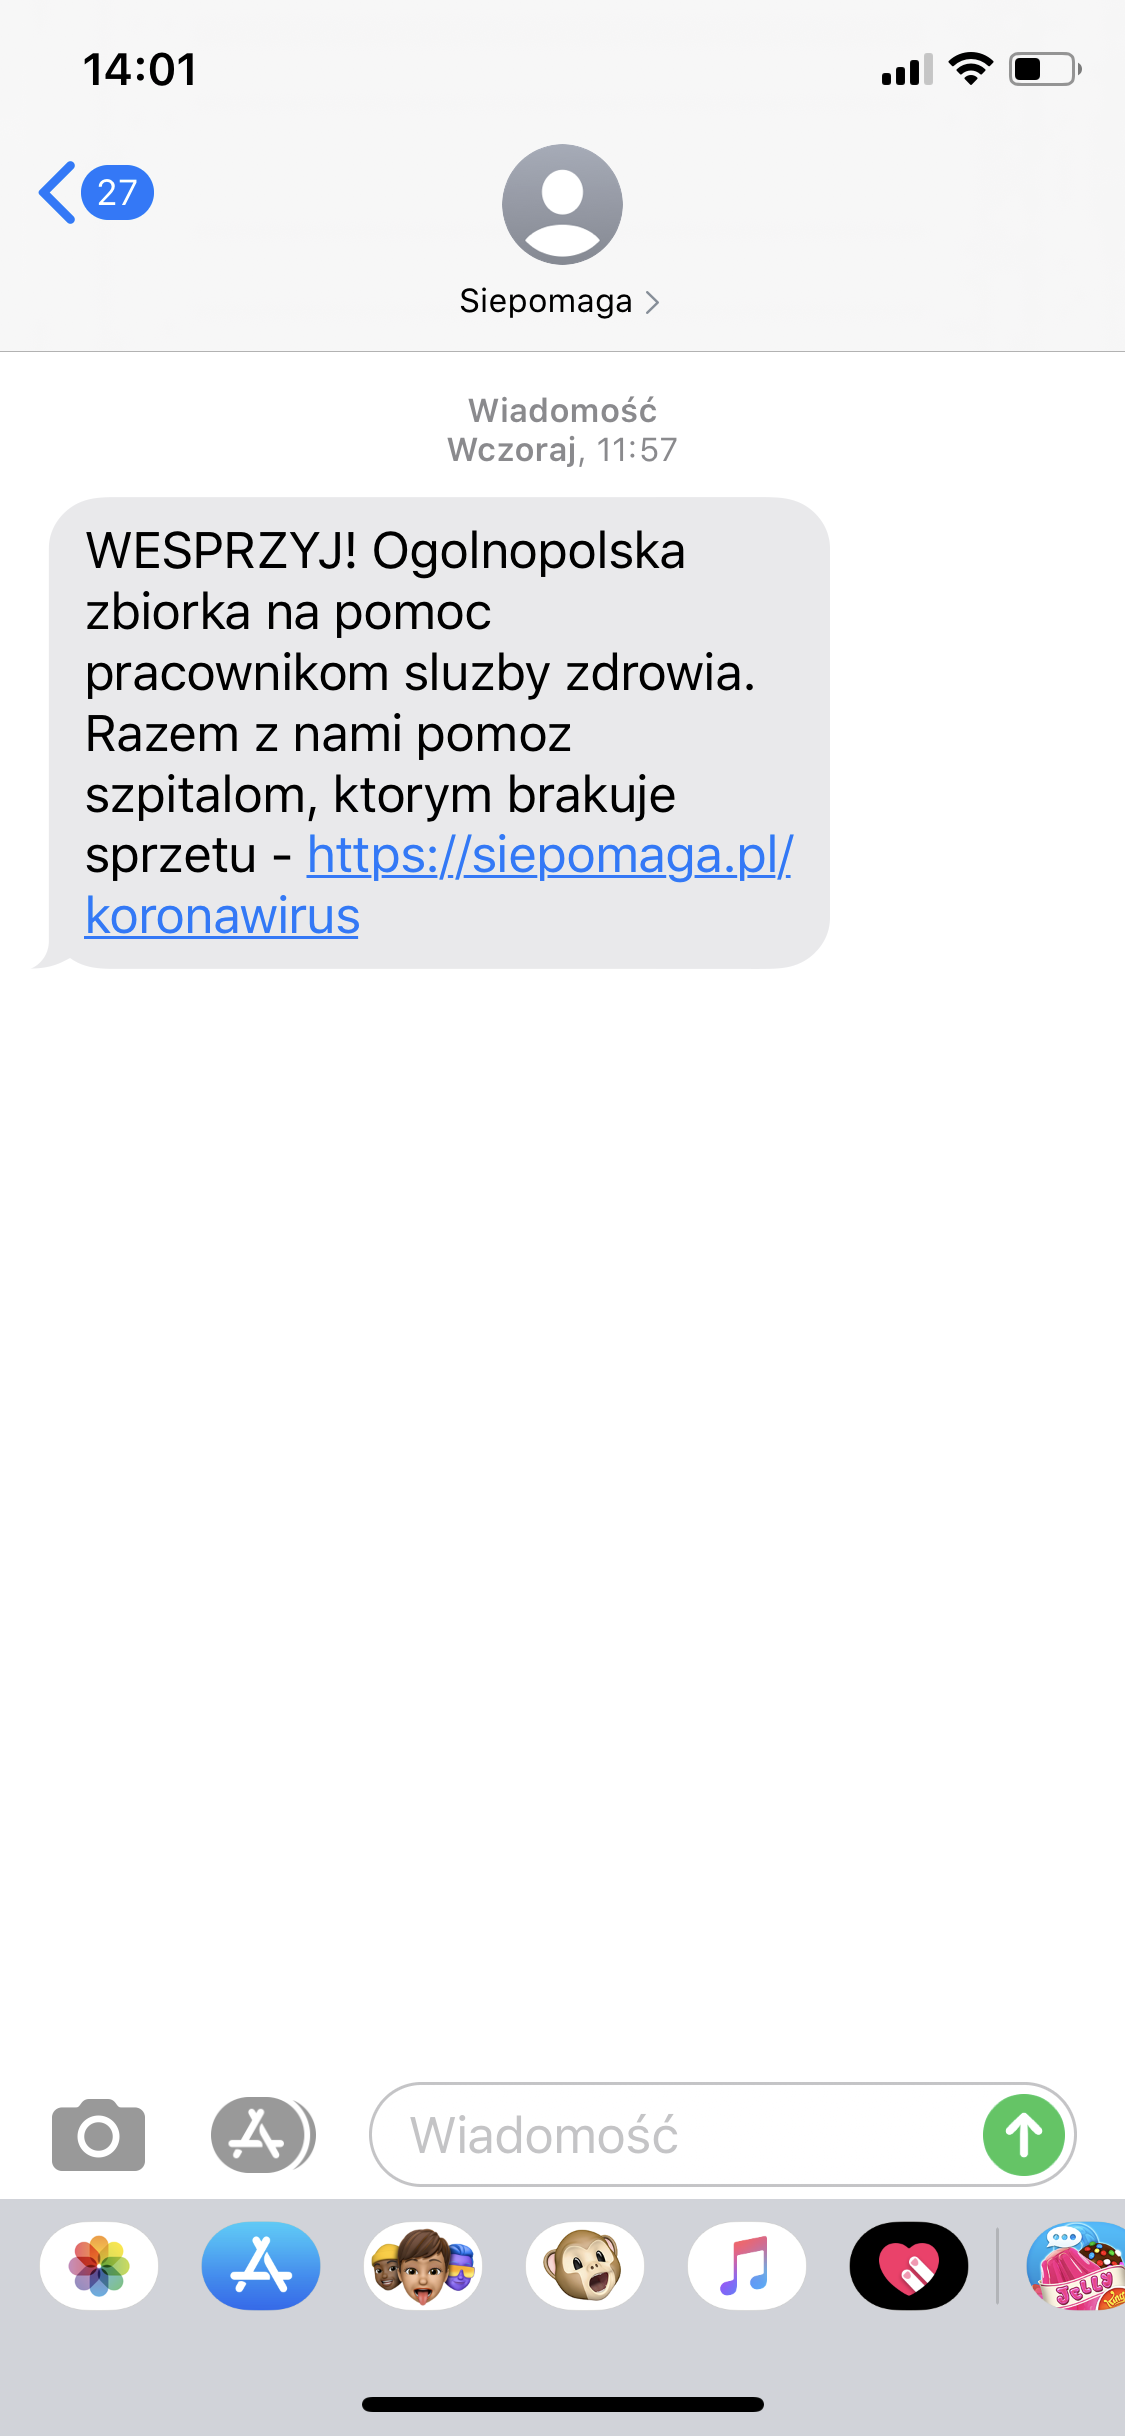 SMSAPI Siepomaga SMS